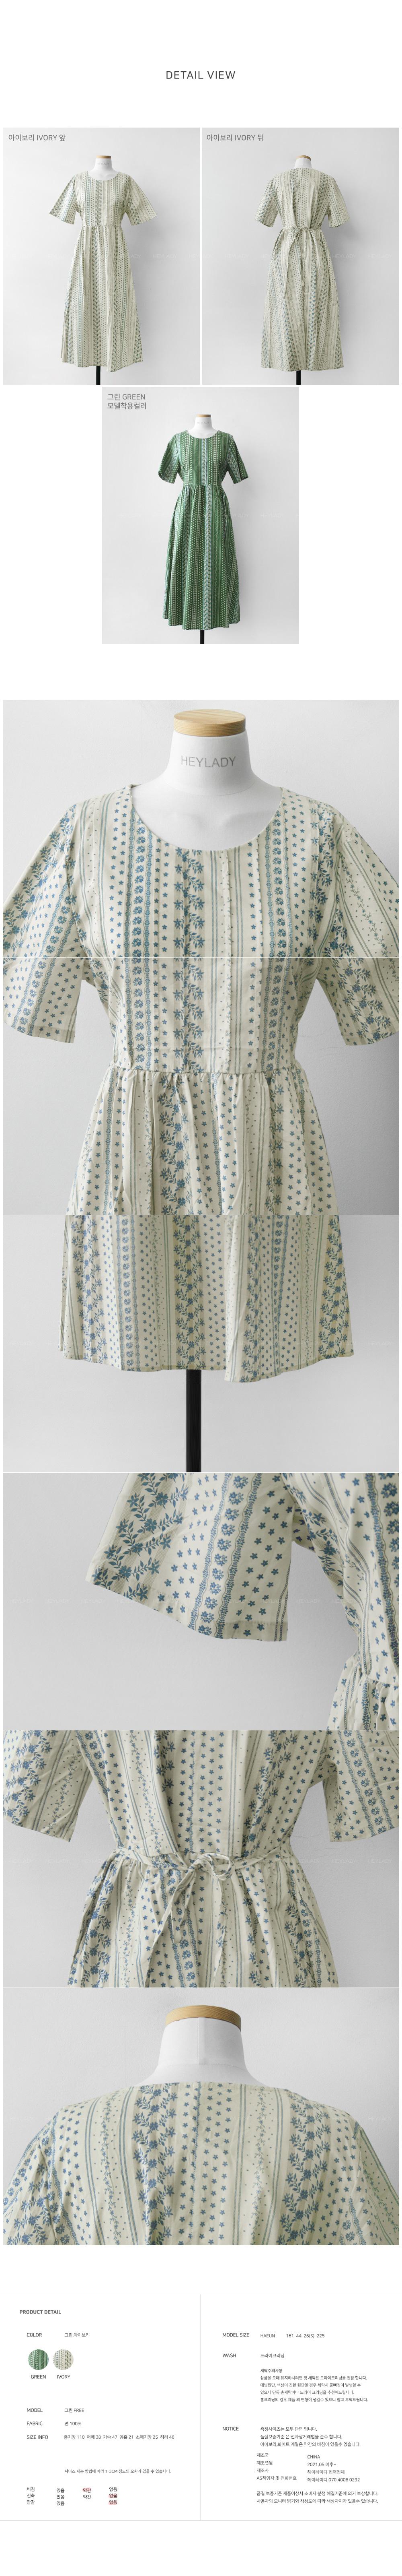 Lilian cotton Dress